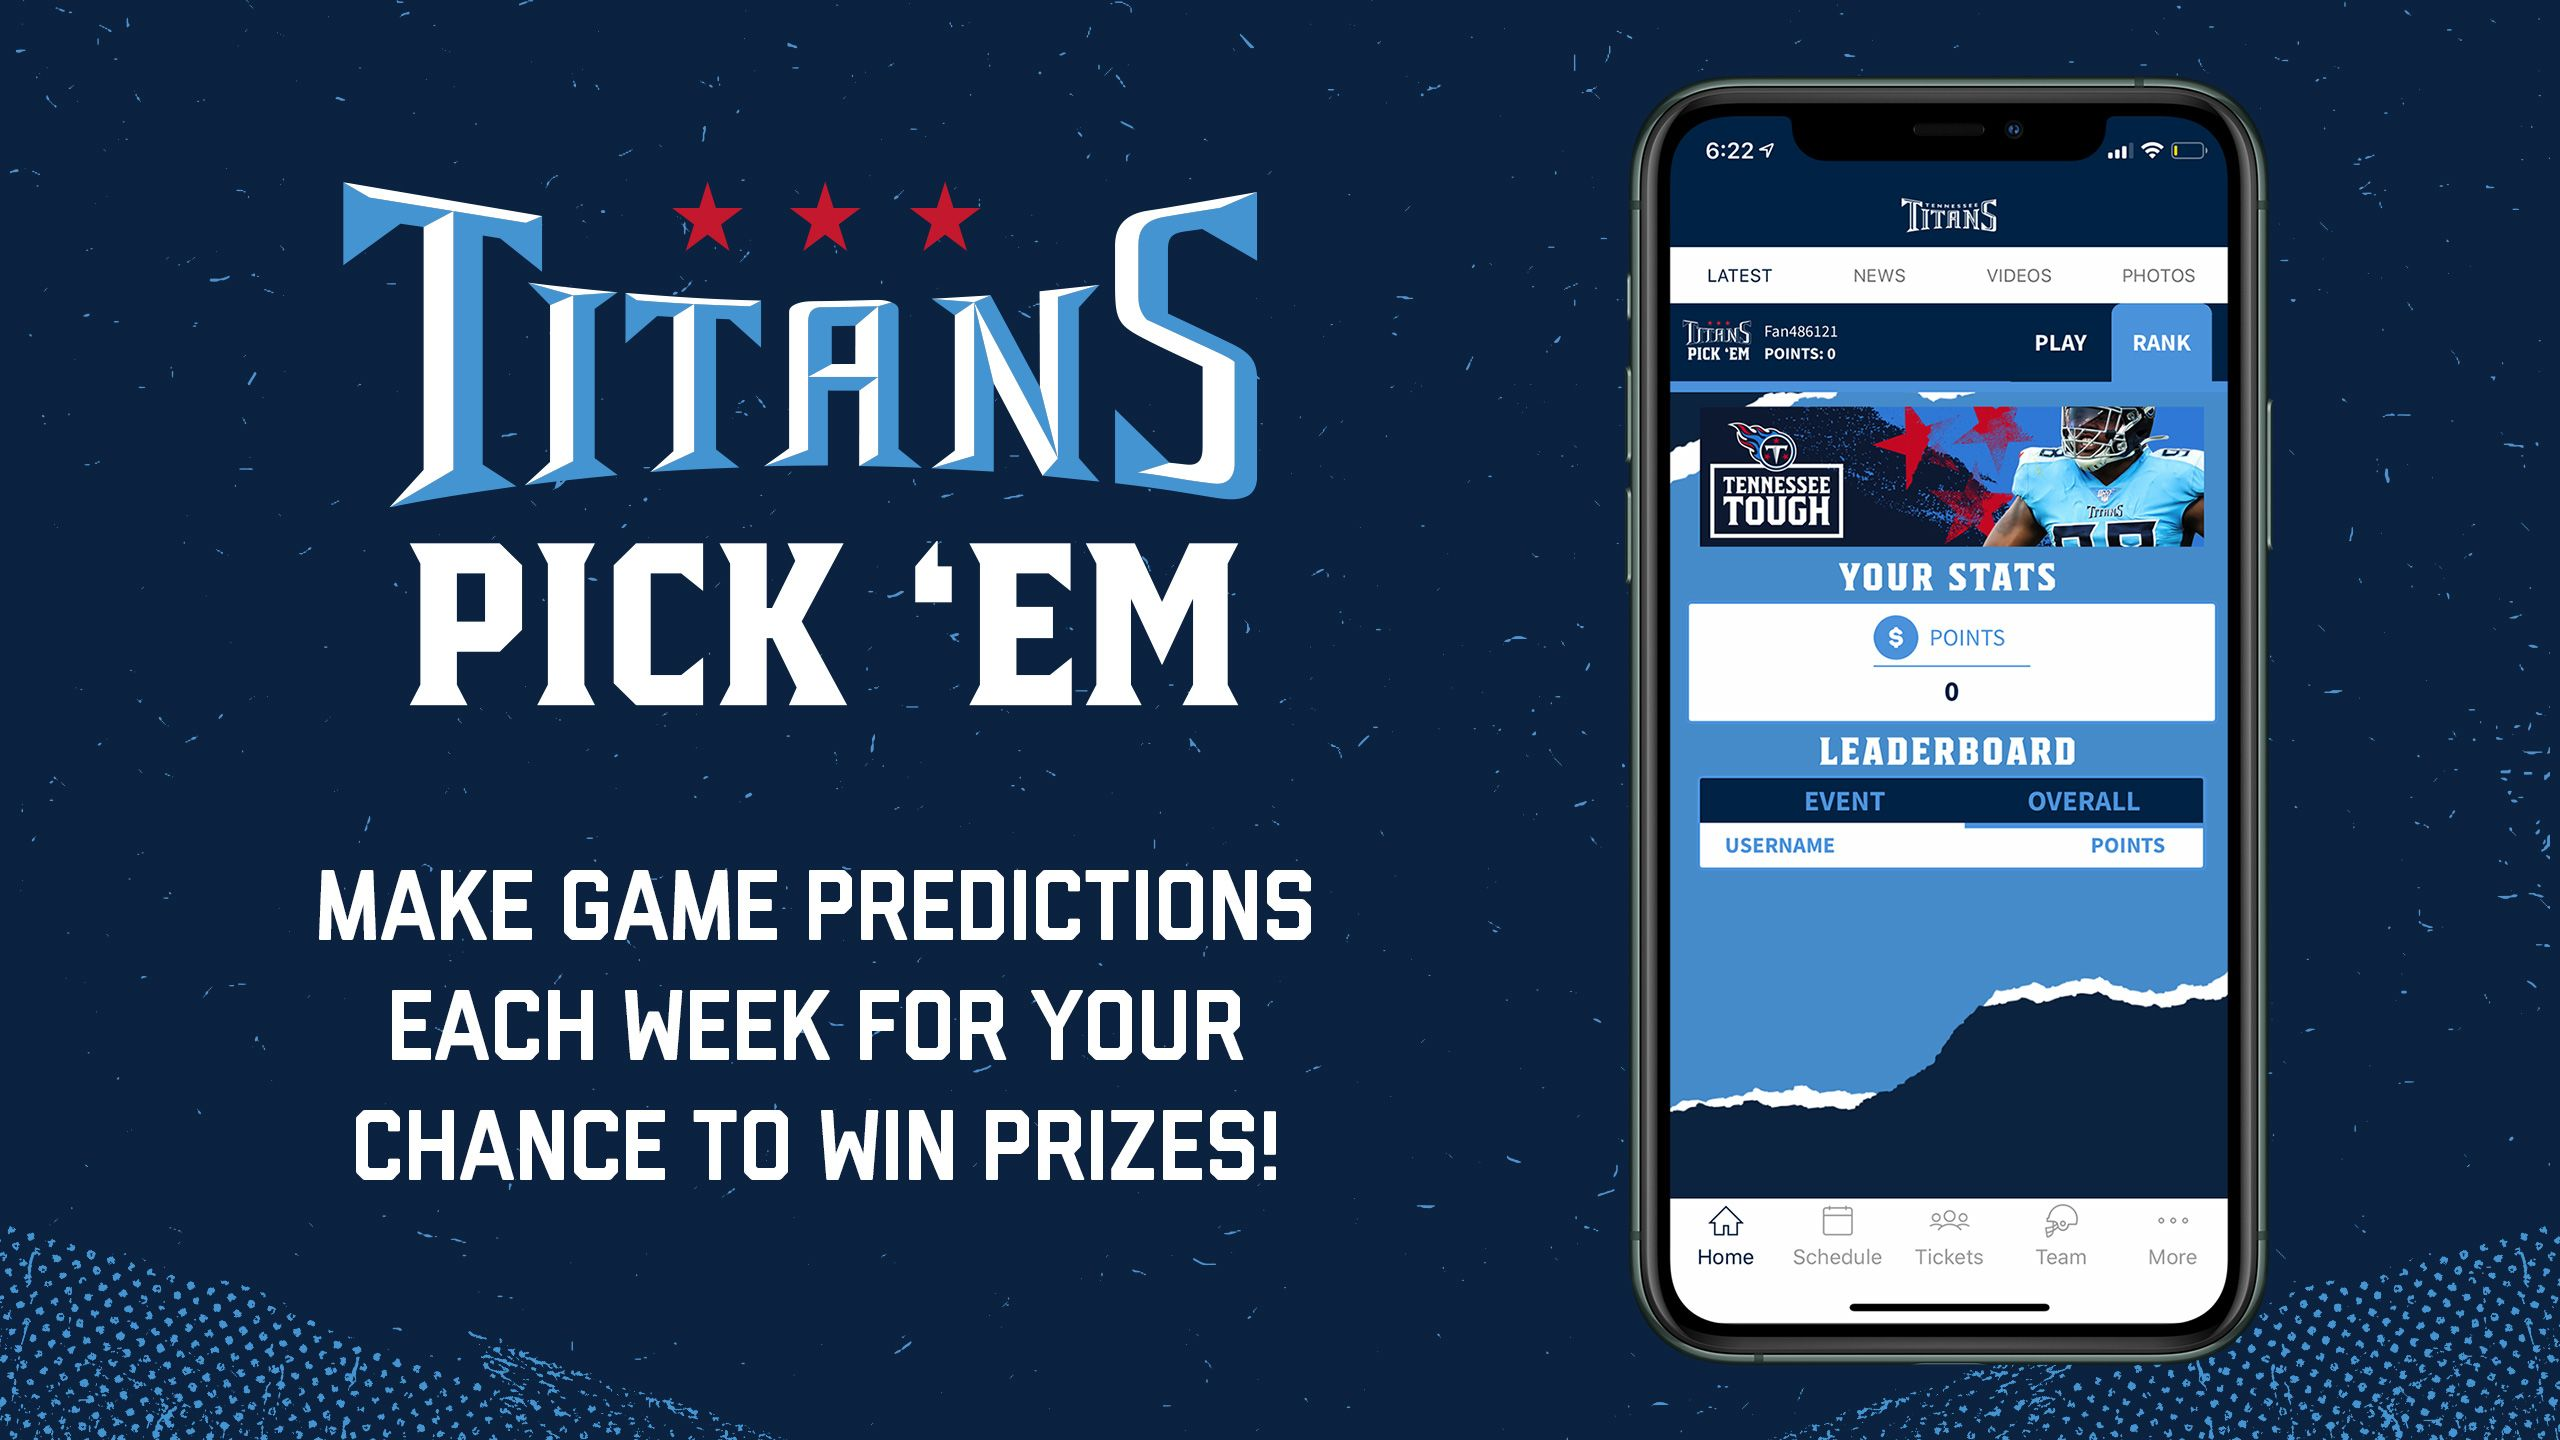 Titans Pick'Em